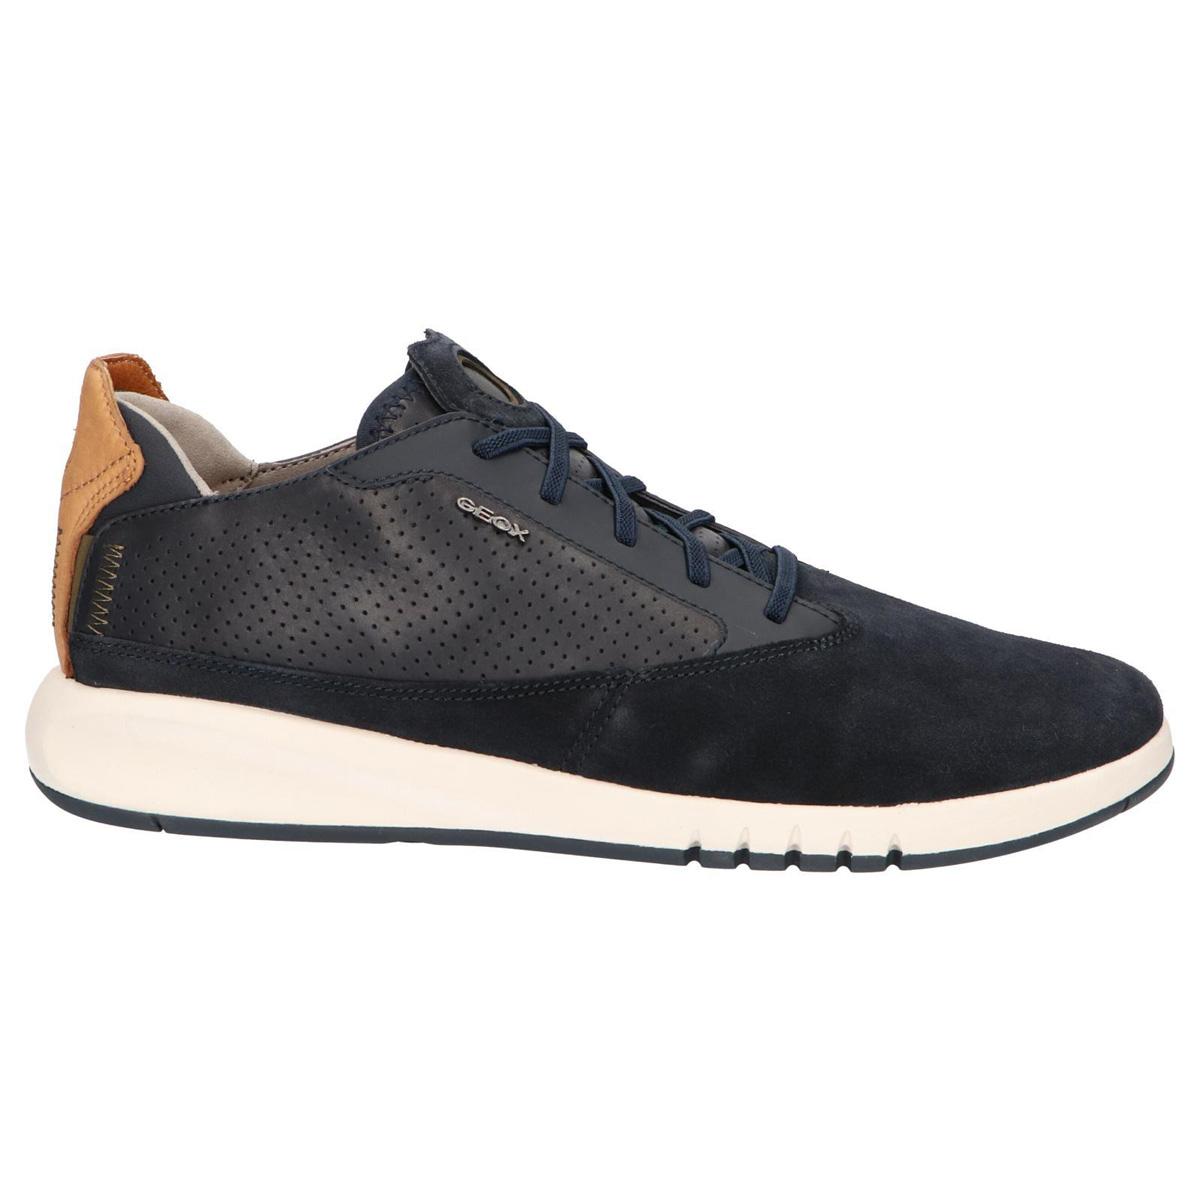 Sneakers Geox Aerantis in pelle e camoscio blu